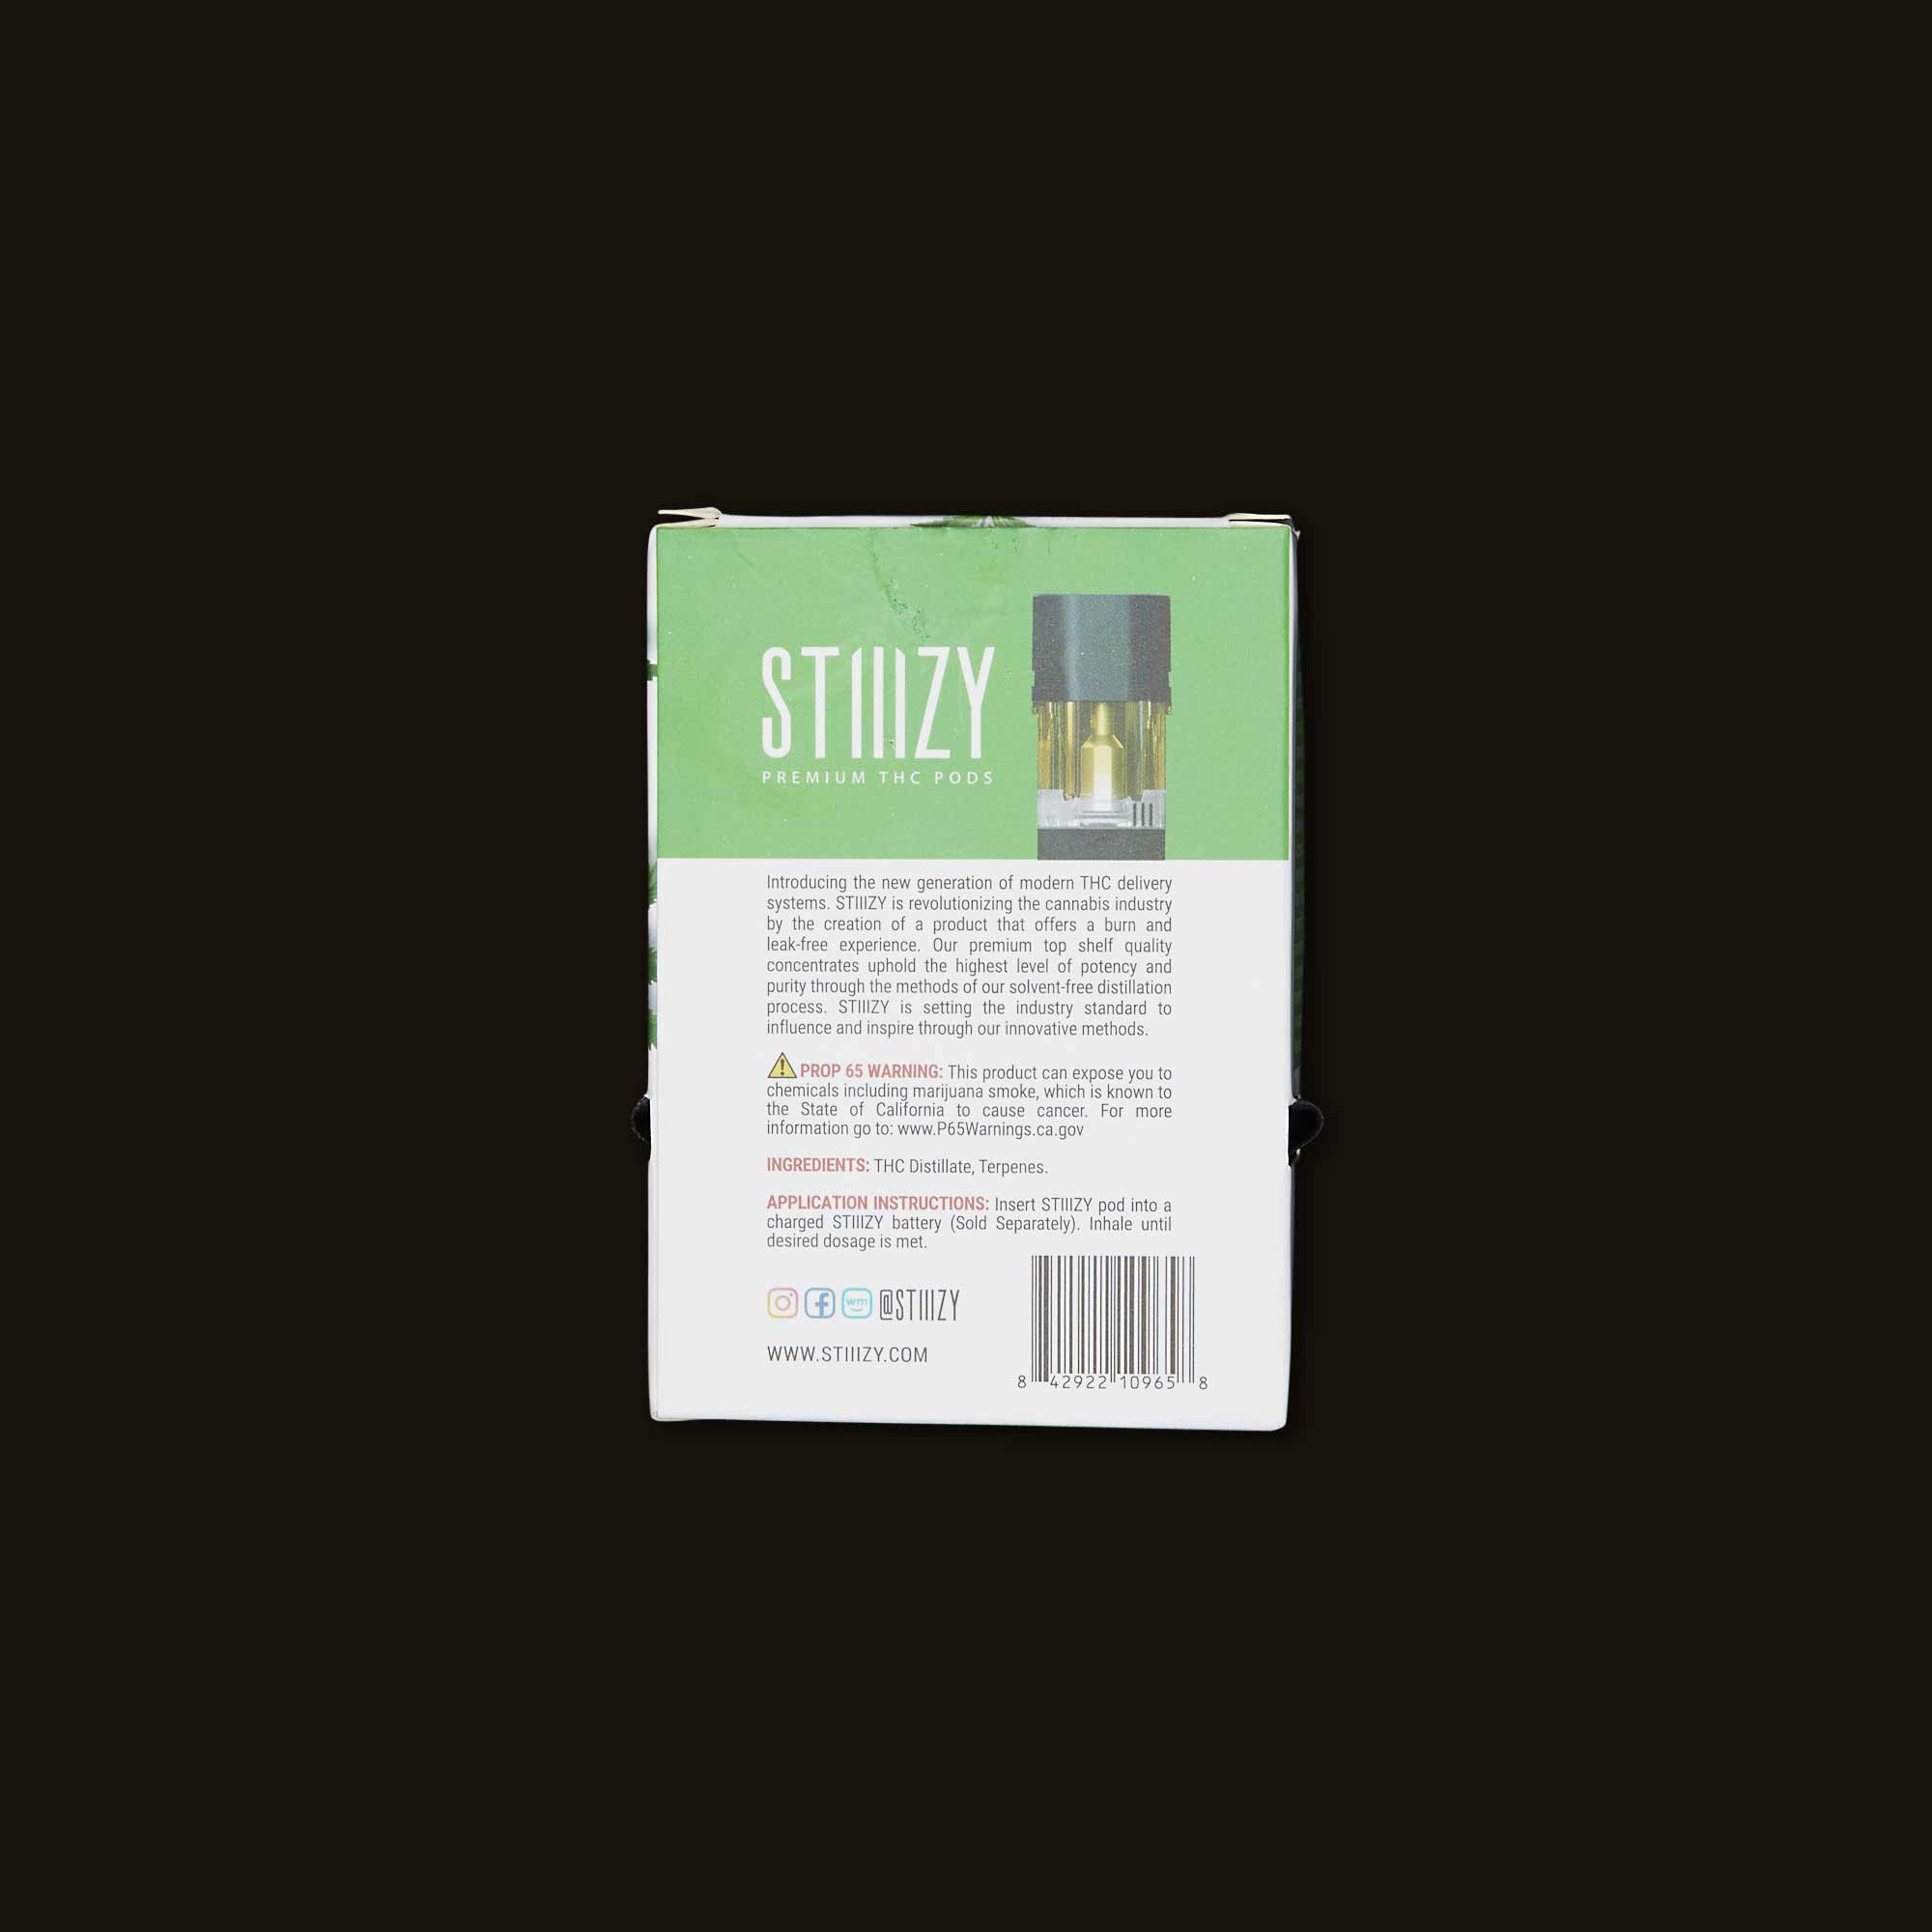 Stiizy Strawnana vape pods back of box packaging with ingredients